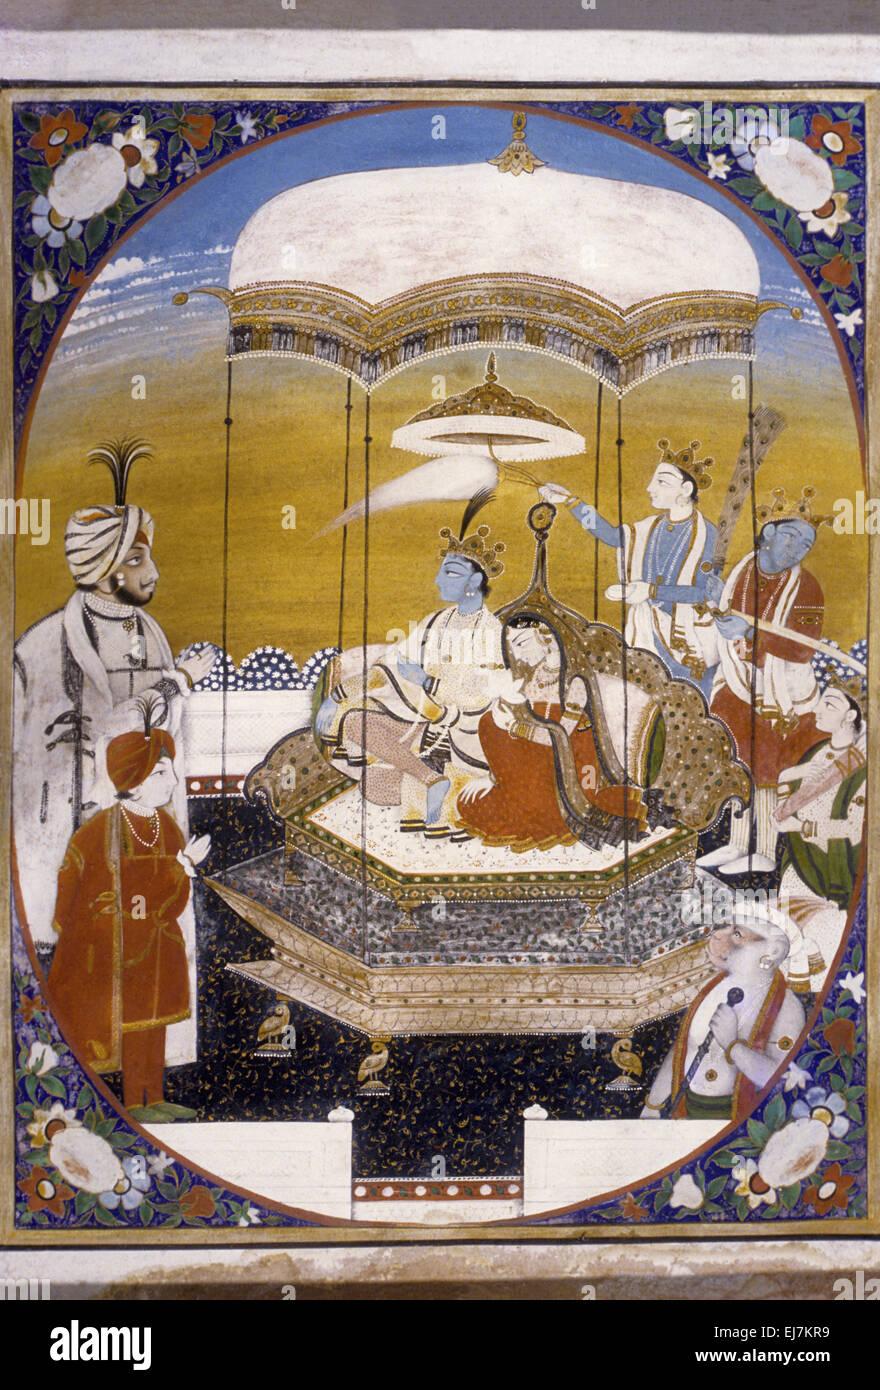 Radha and Krishna in a Pavilion. Sikh school circa 1850 AD India - Stock Image